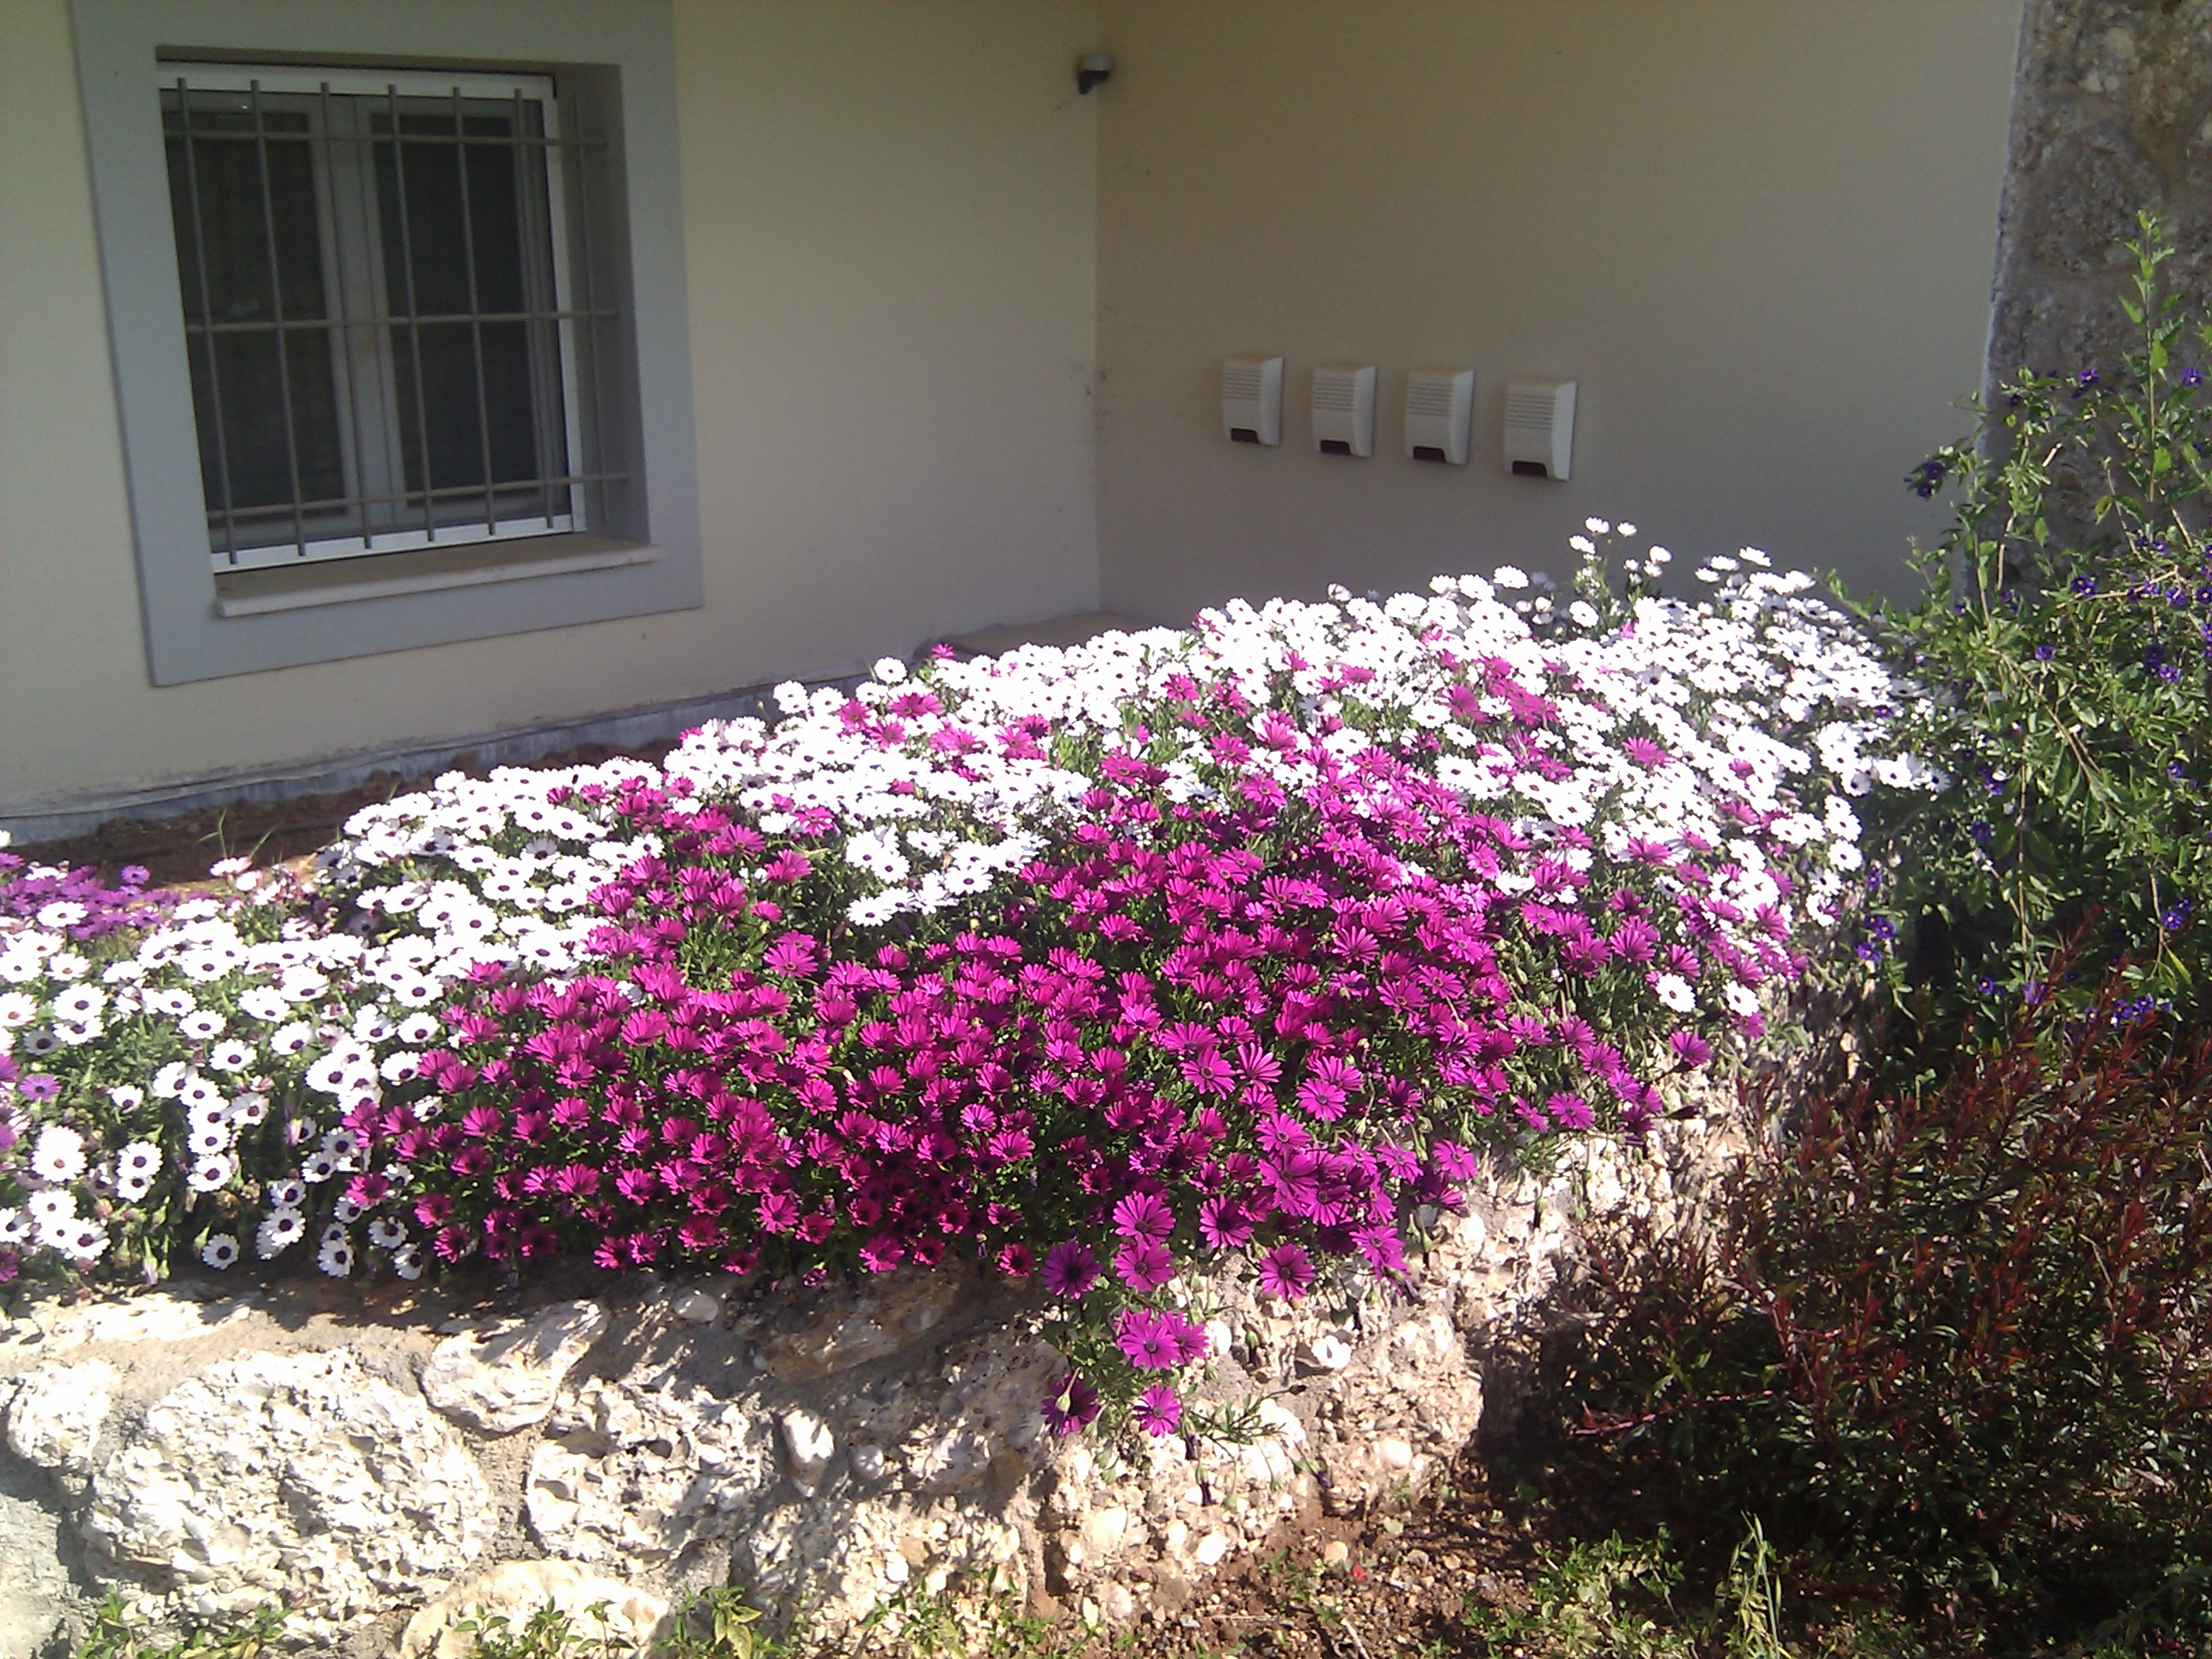 Filetolle Blumen überall Panoramiojpg Wikimedia Commons